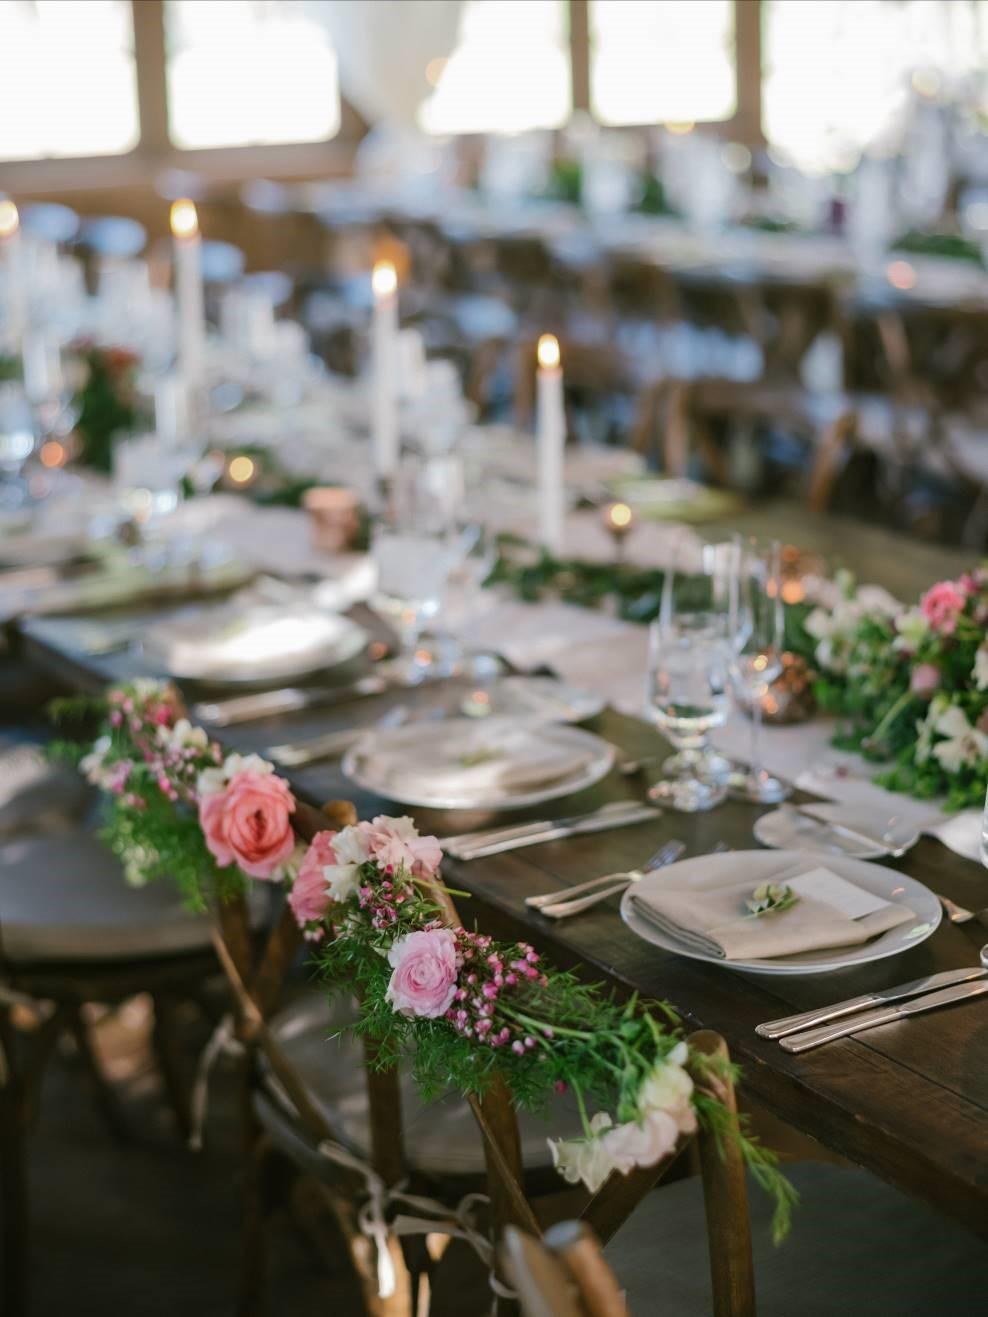 C_Weddings_EventoftheSeason.jpg